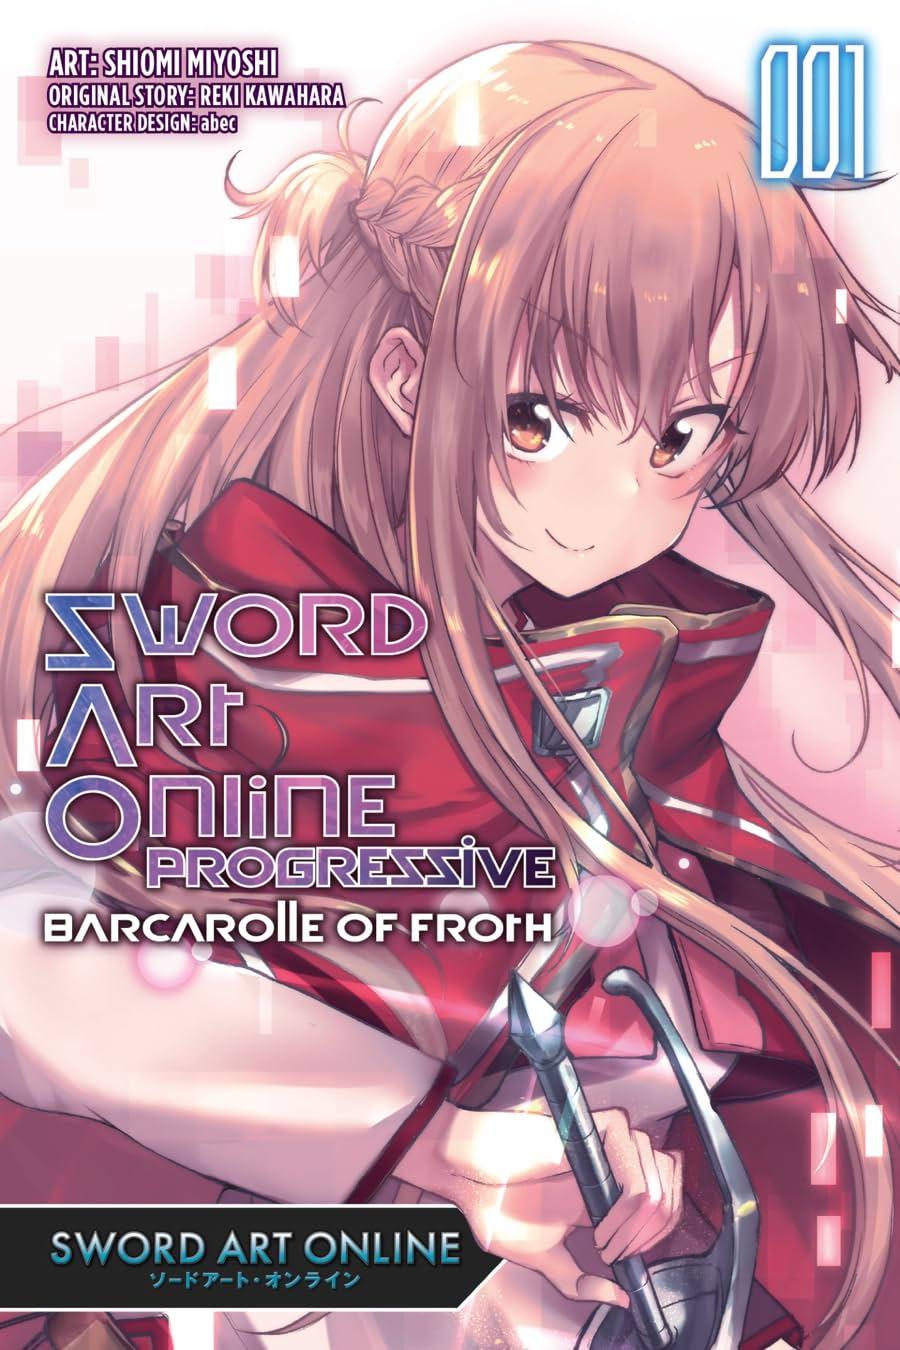 Sword Art Online Progressive Barcarolle of Froth Vol. 1